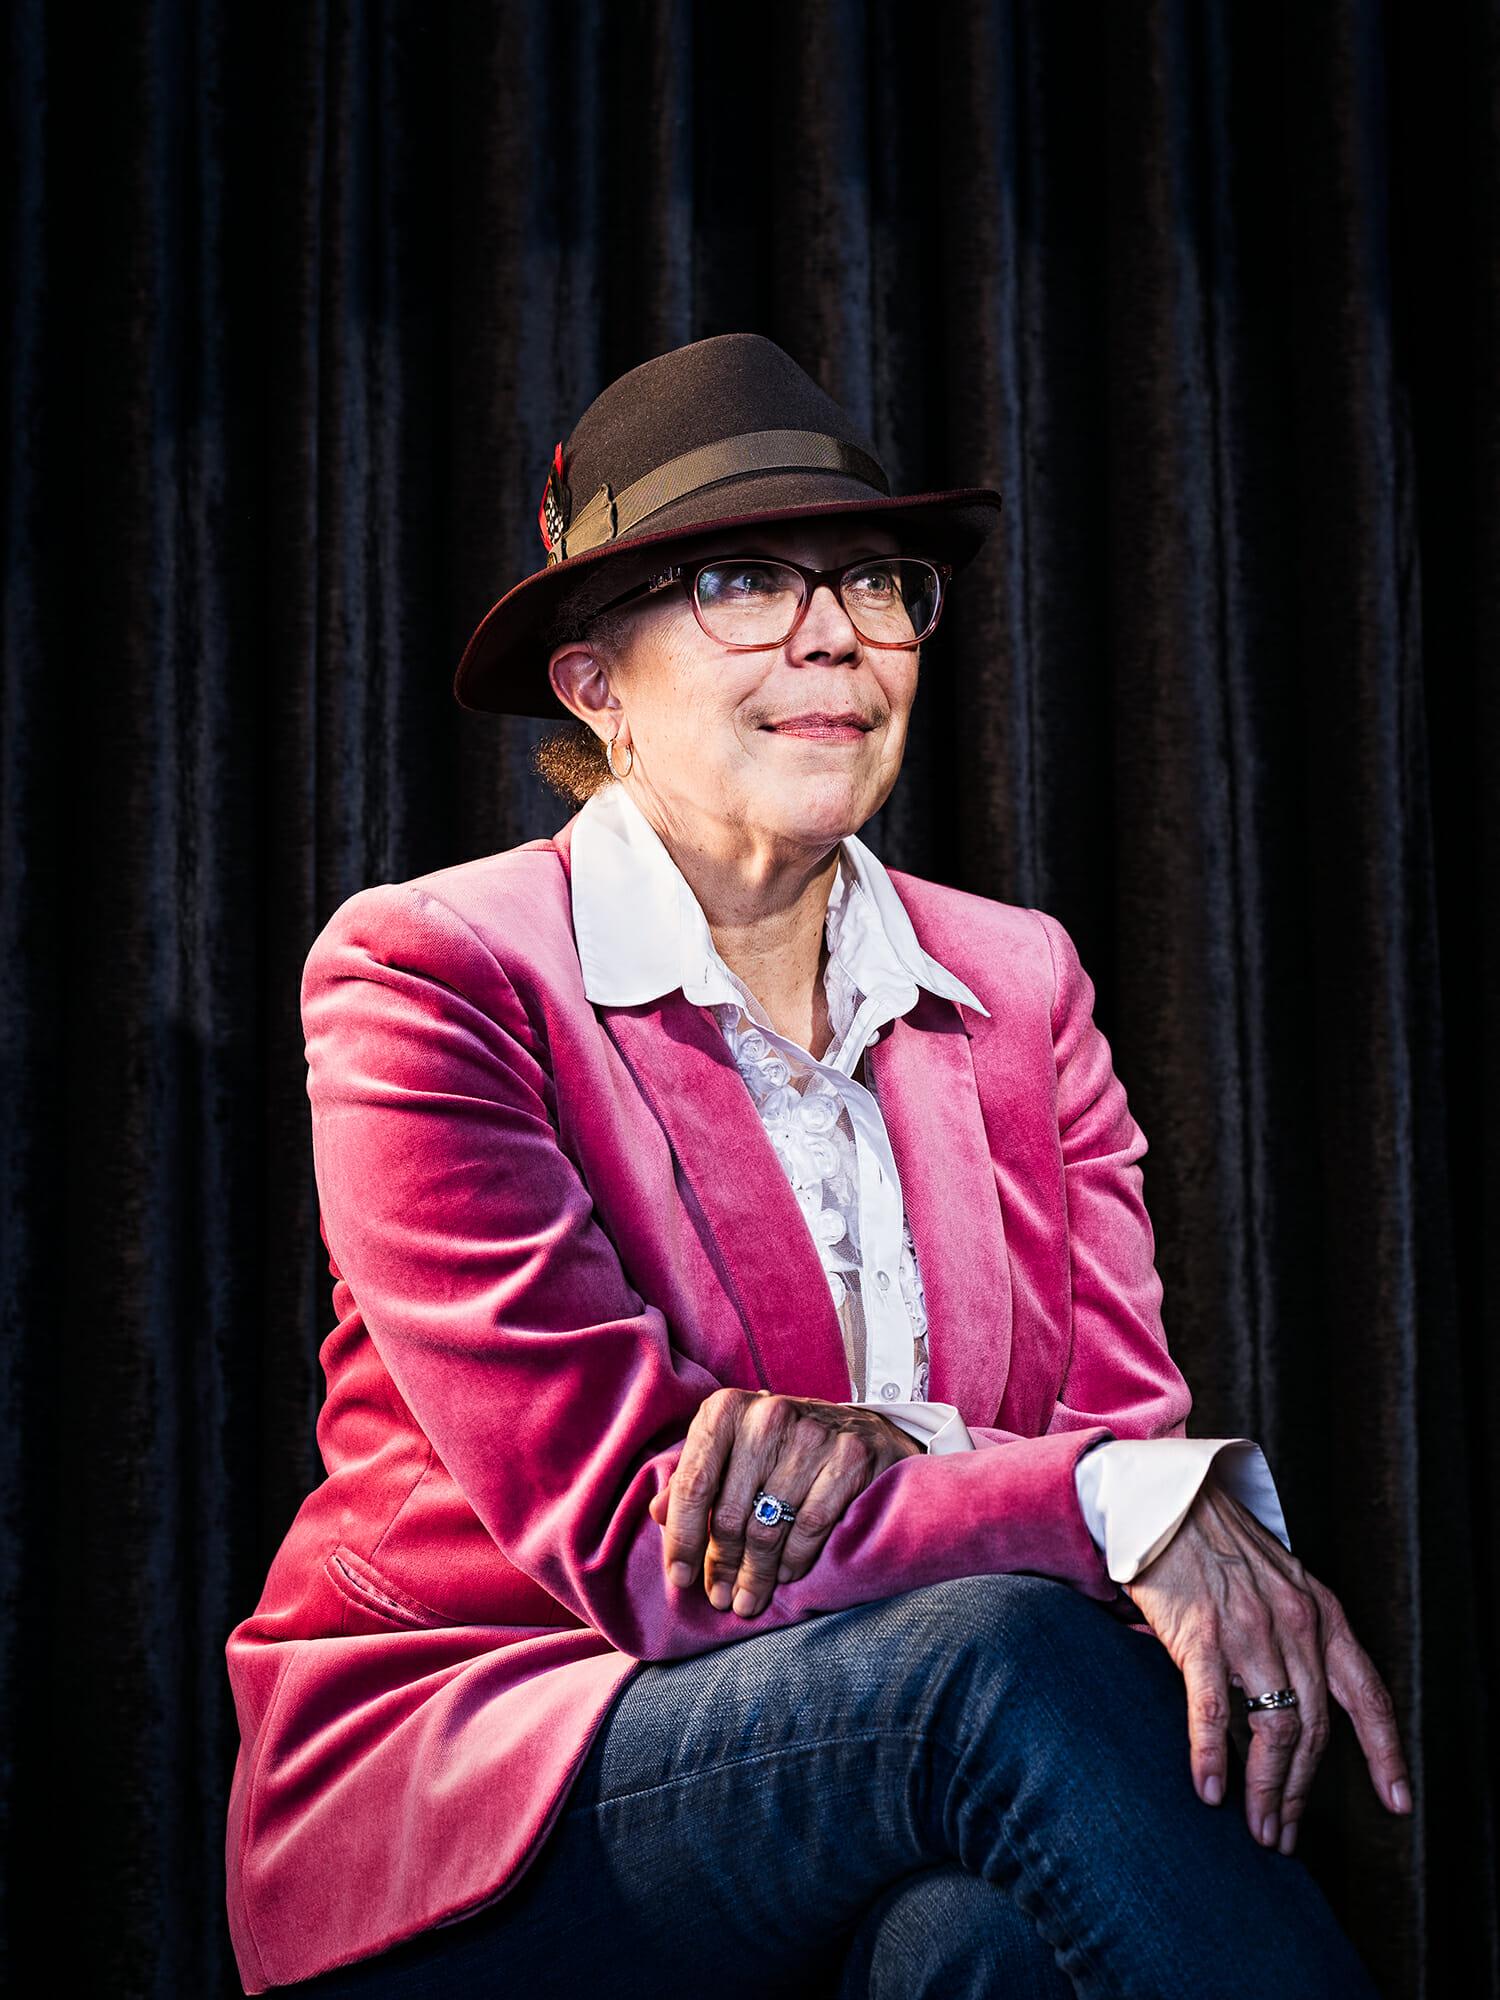 Portrait of Maira Benjamin, head of engineering at Pandora